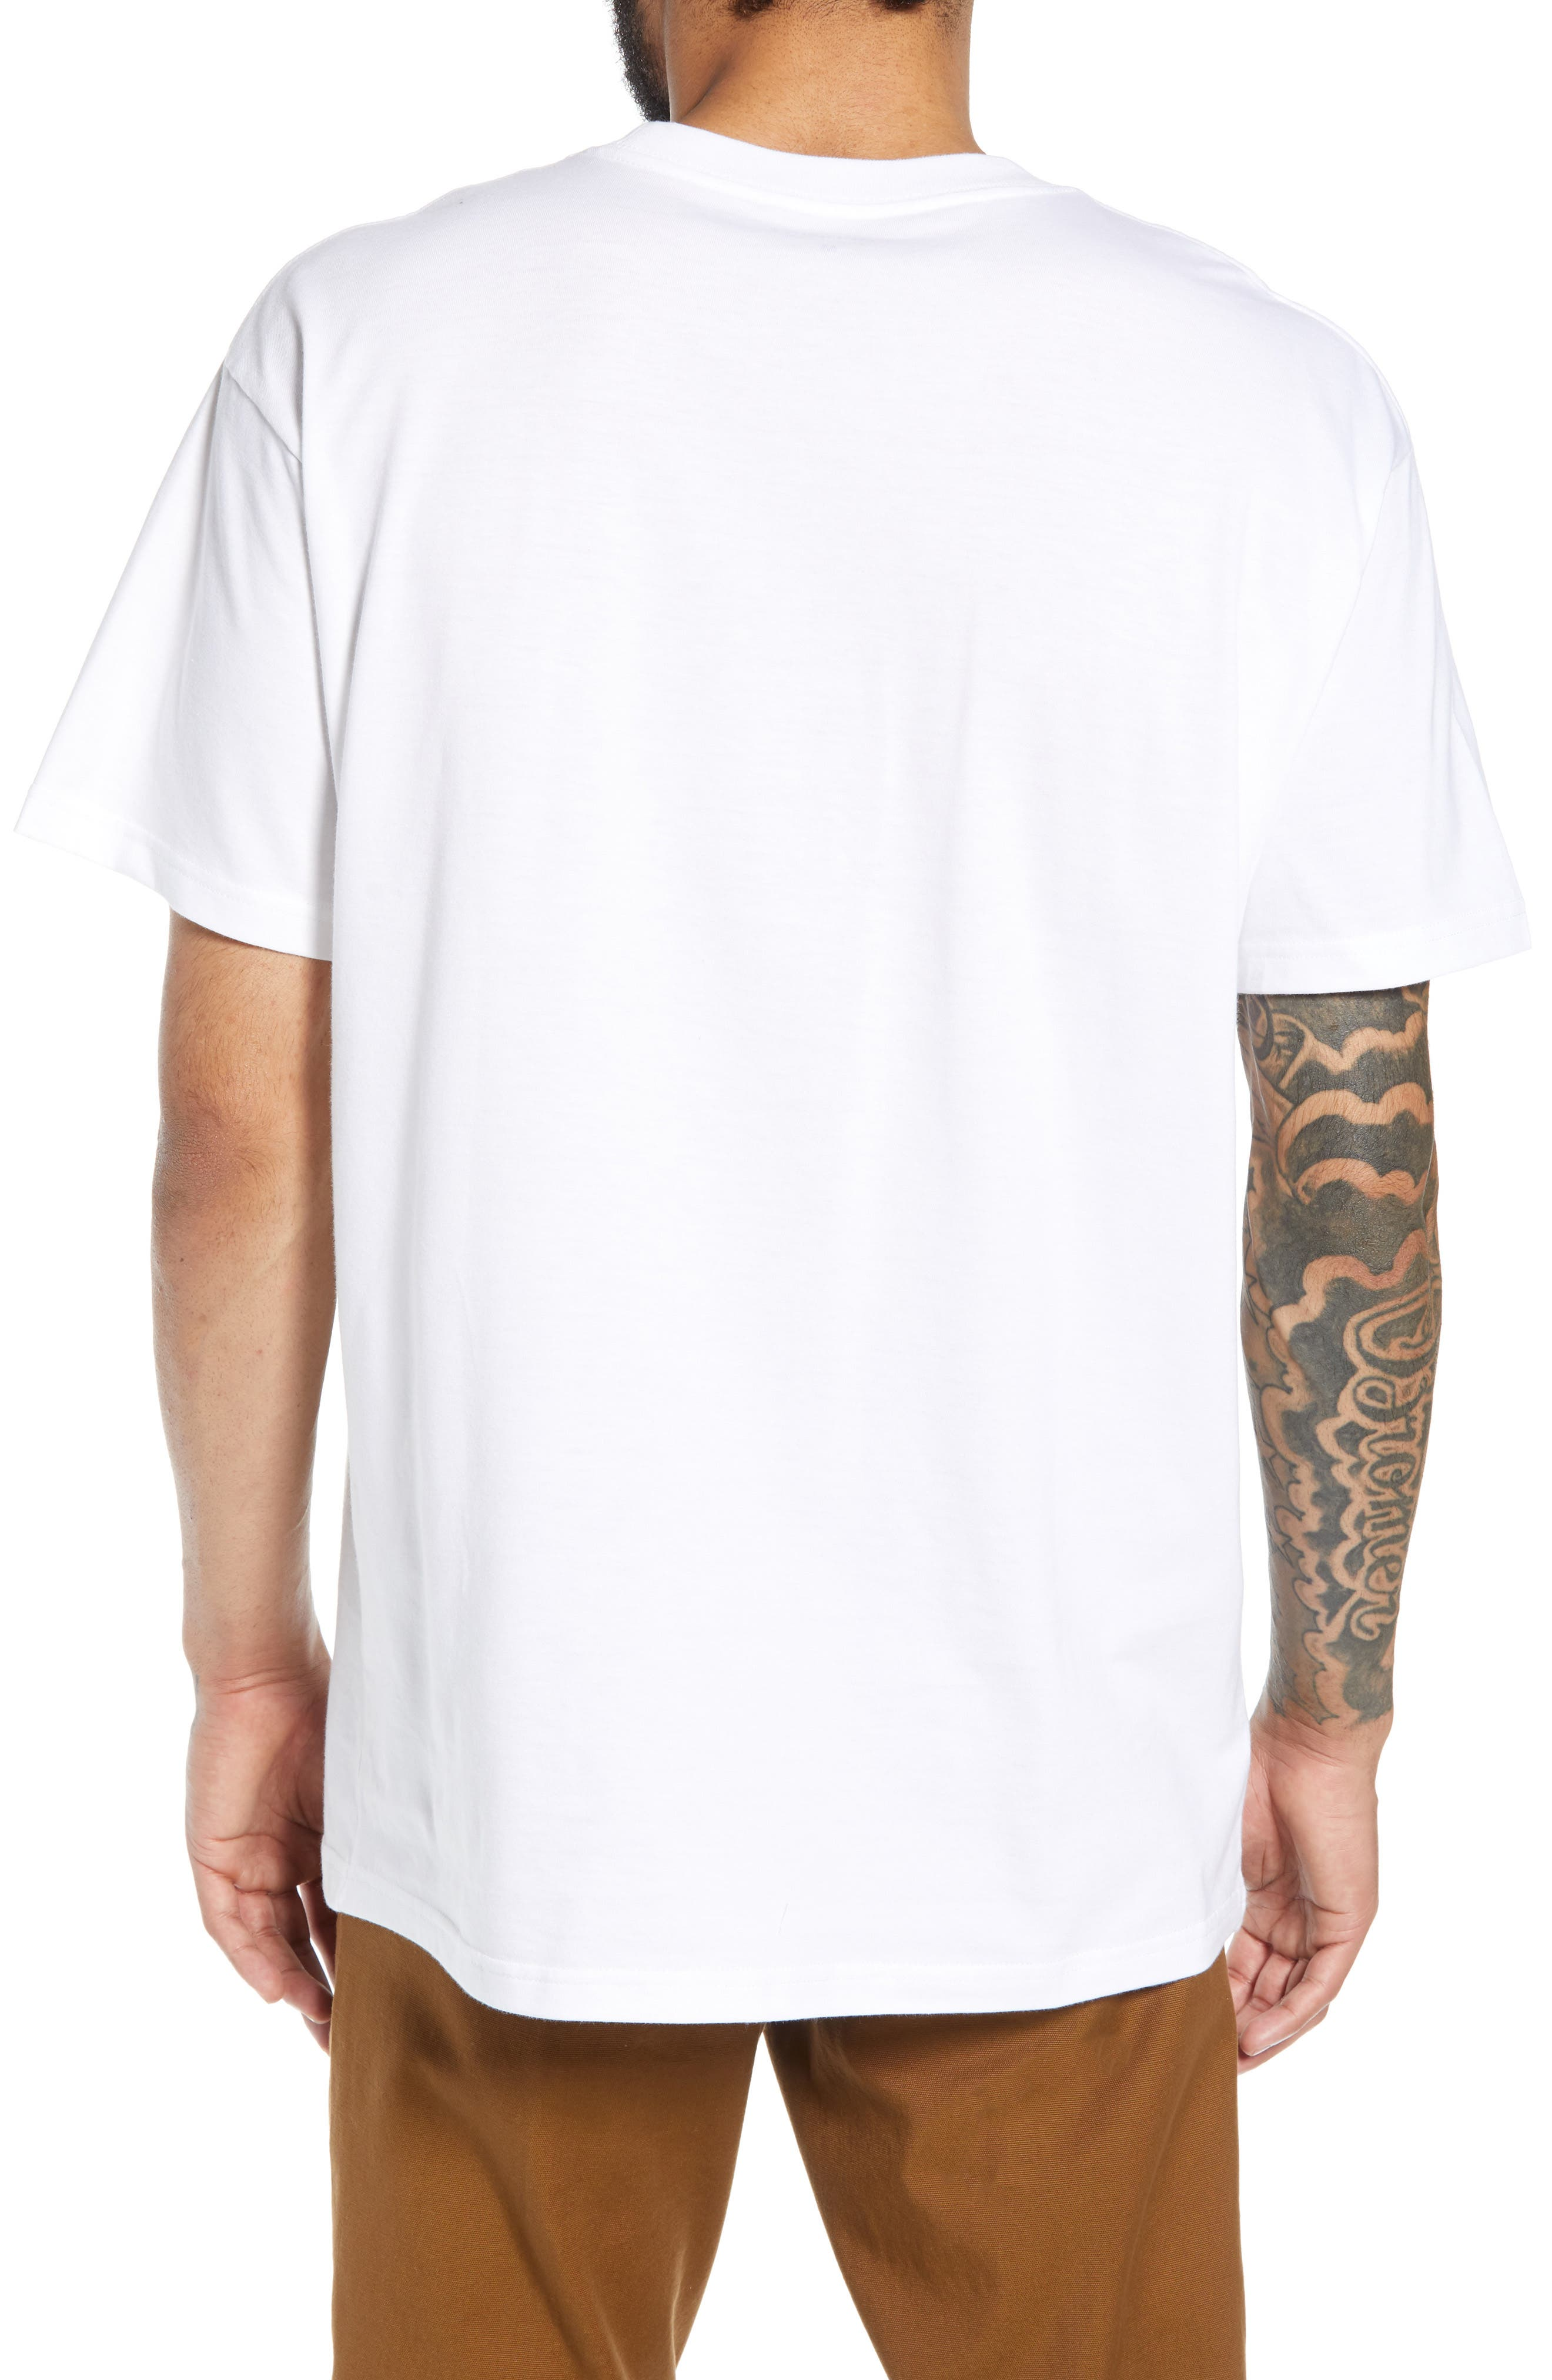 Panther Graphic T-Shirt,                             Alternate thumbnail 2, color,                             WHITE / BLACK